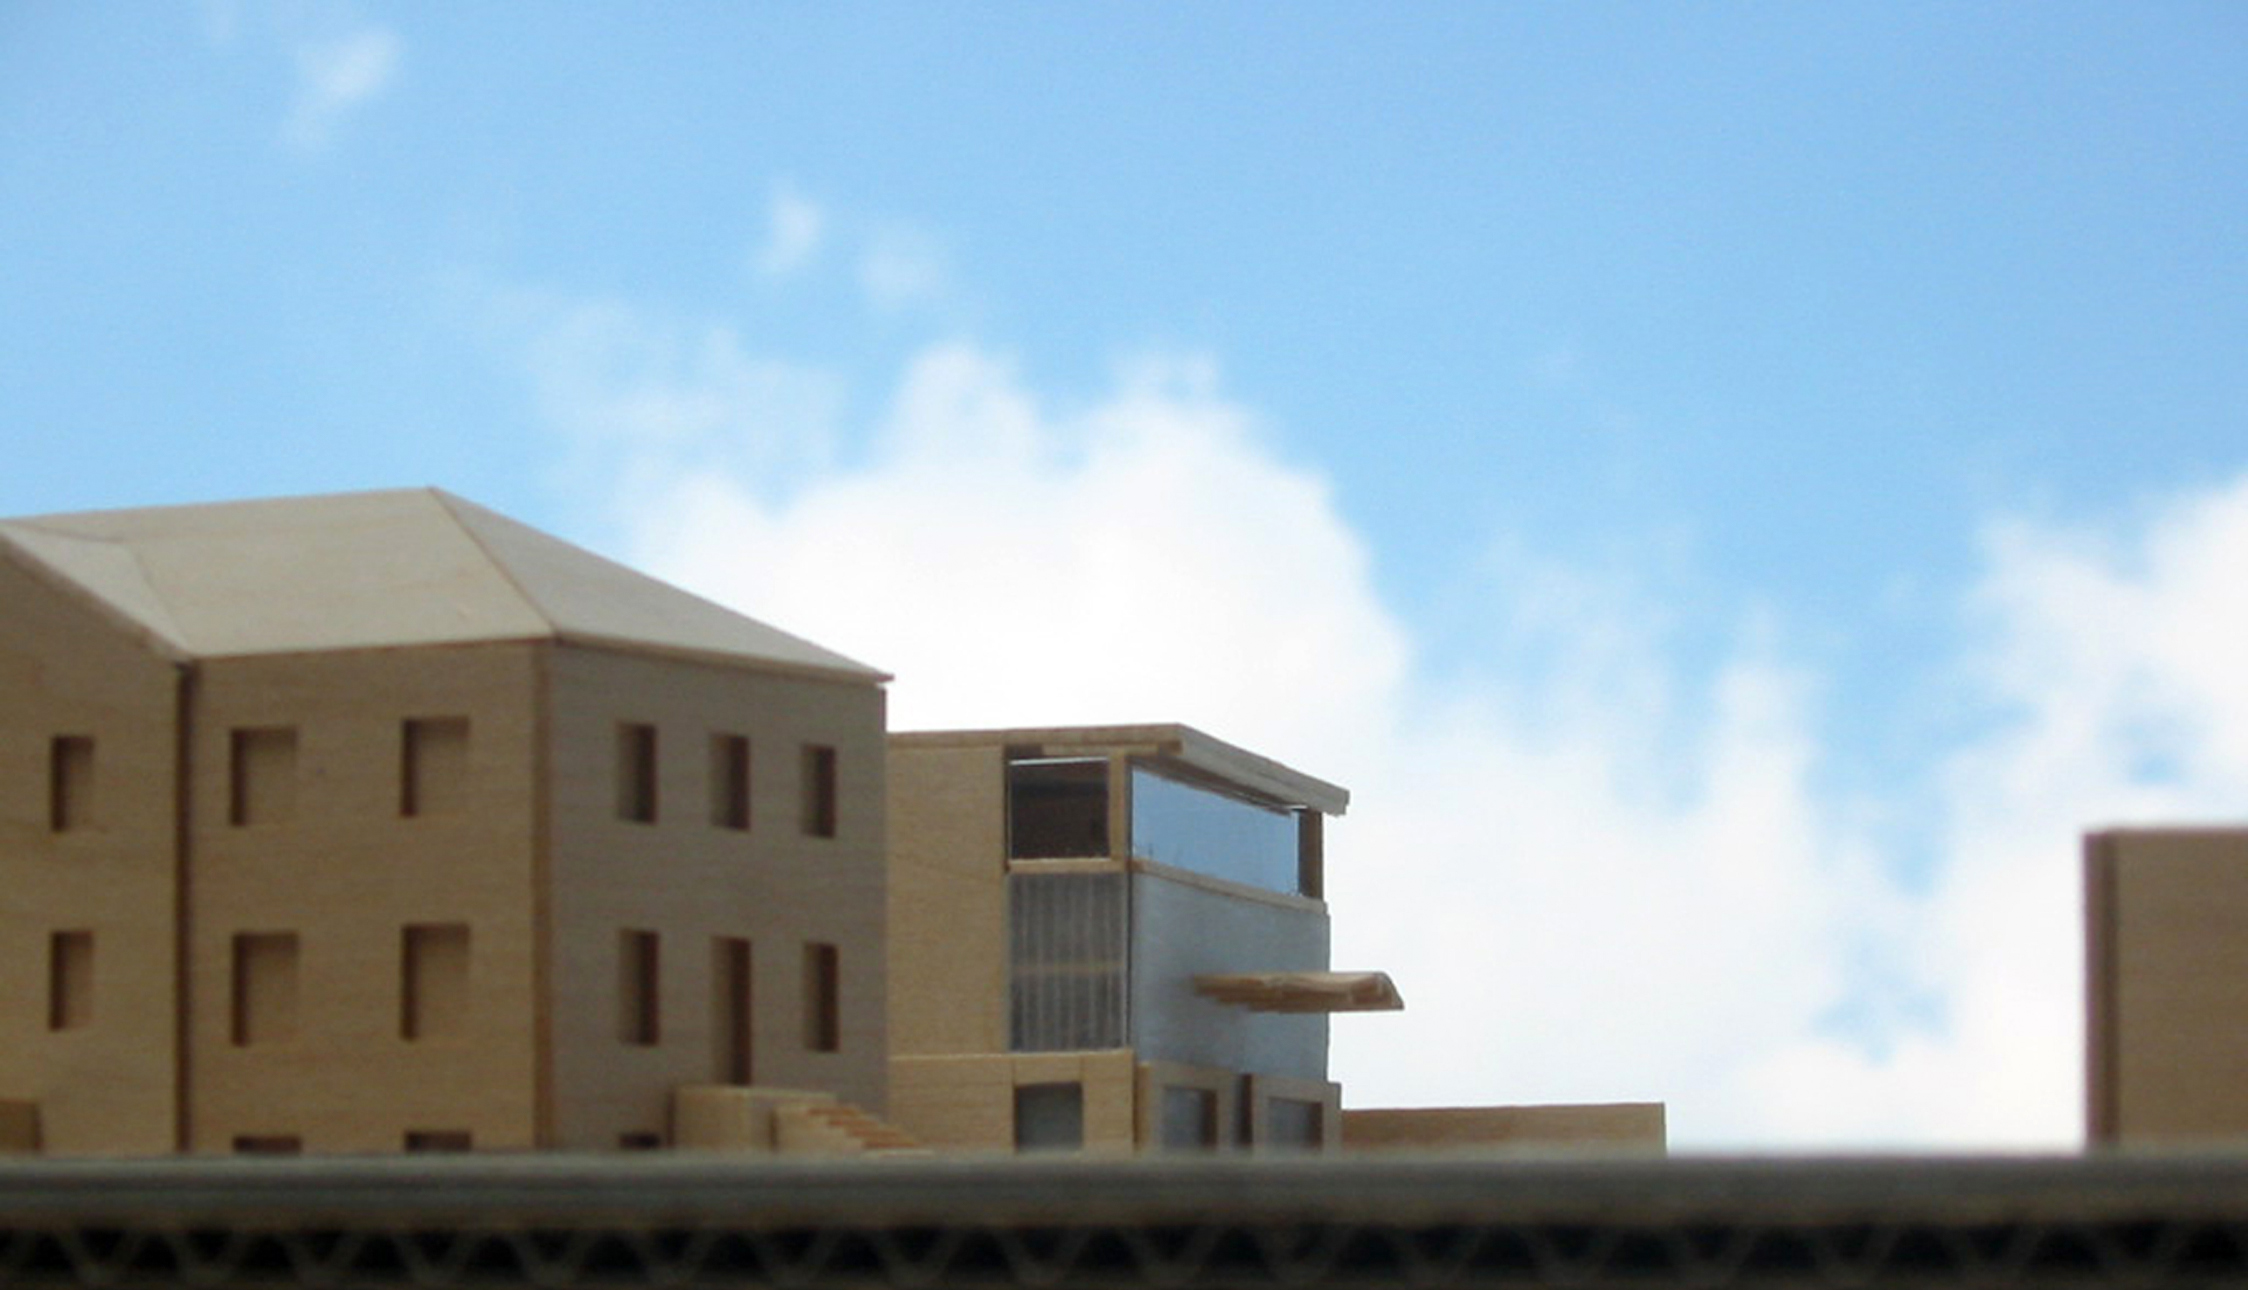 architect: gary shoemaker architects pc  project architect for gary shoemaker architects pc